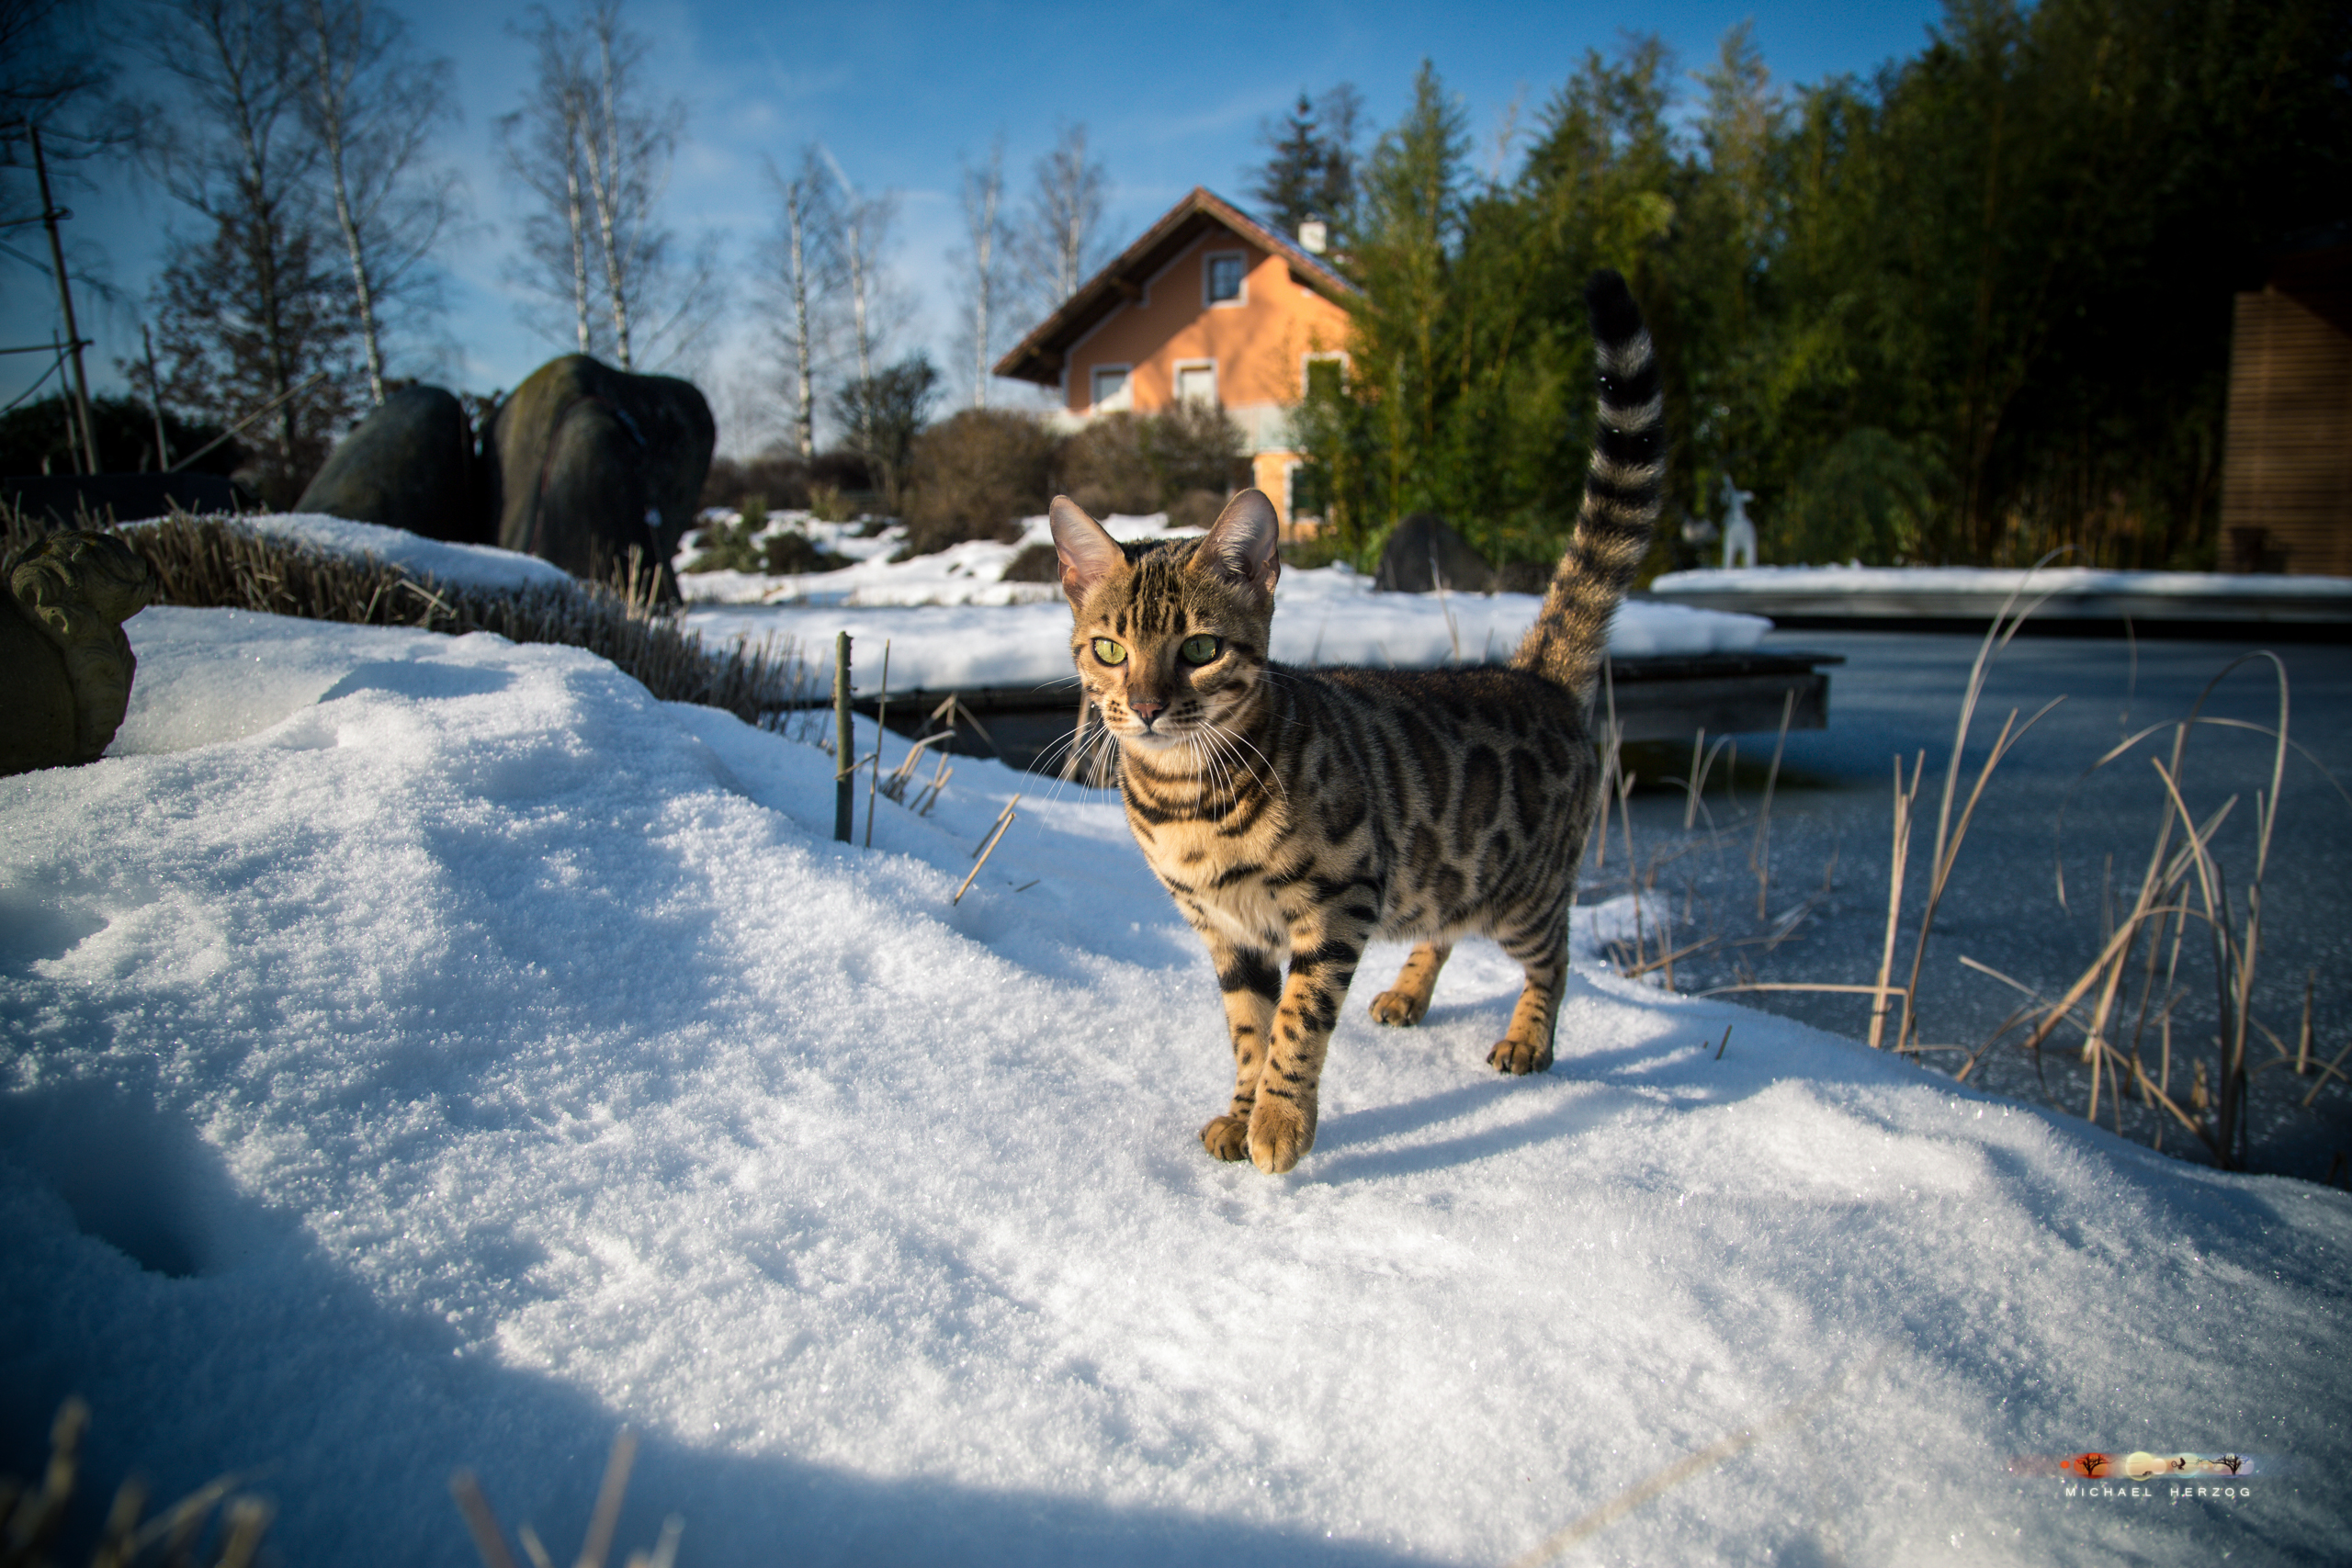 BALUARI_Winter2019_Garten_MichaelHerzog-8517.jpg